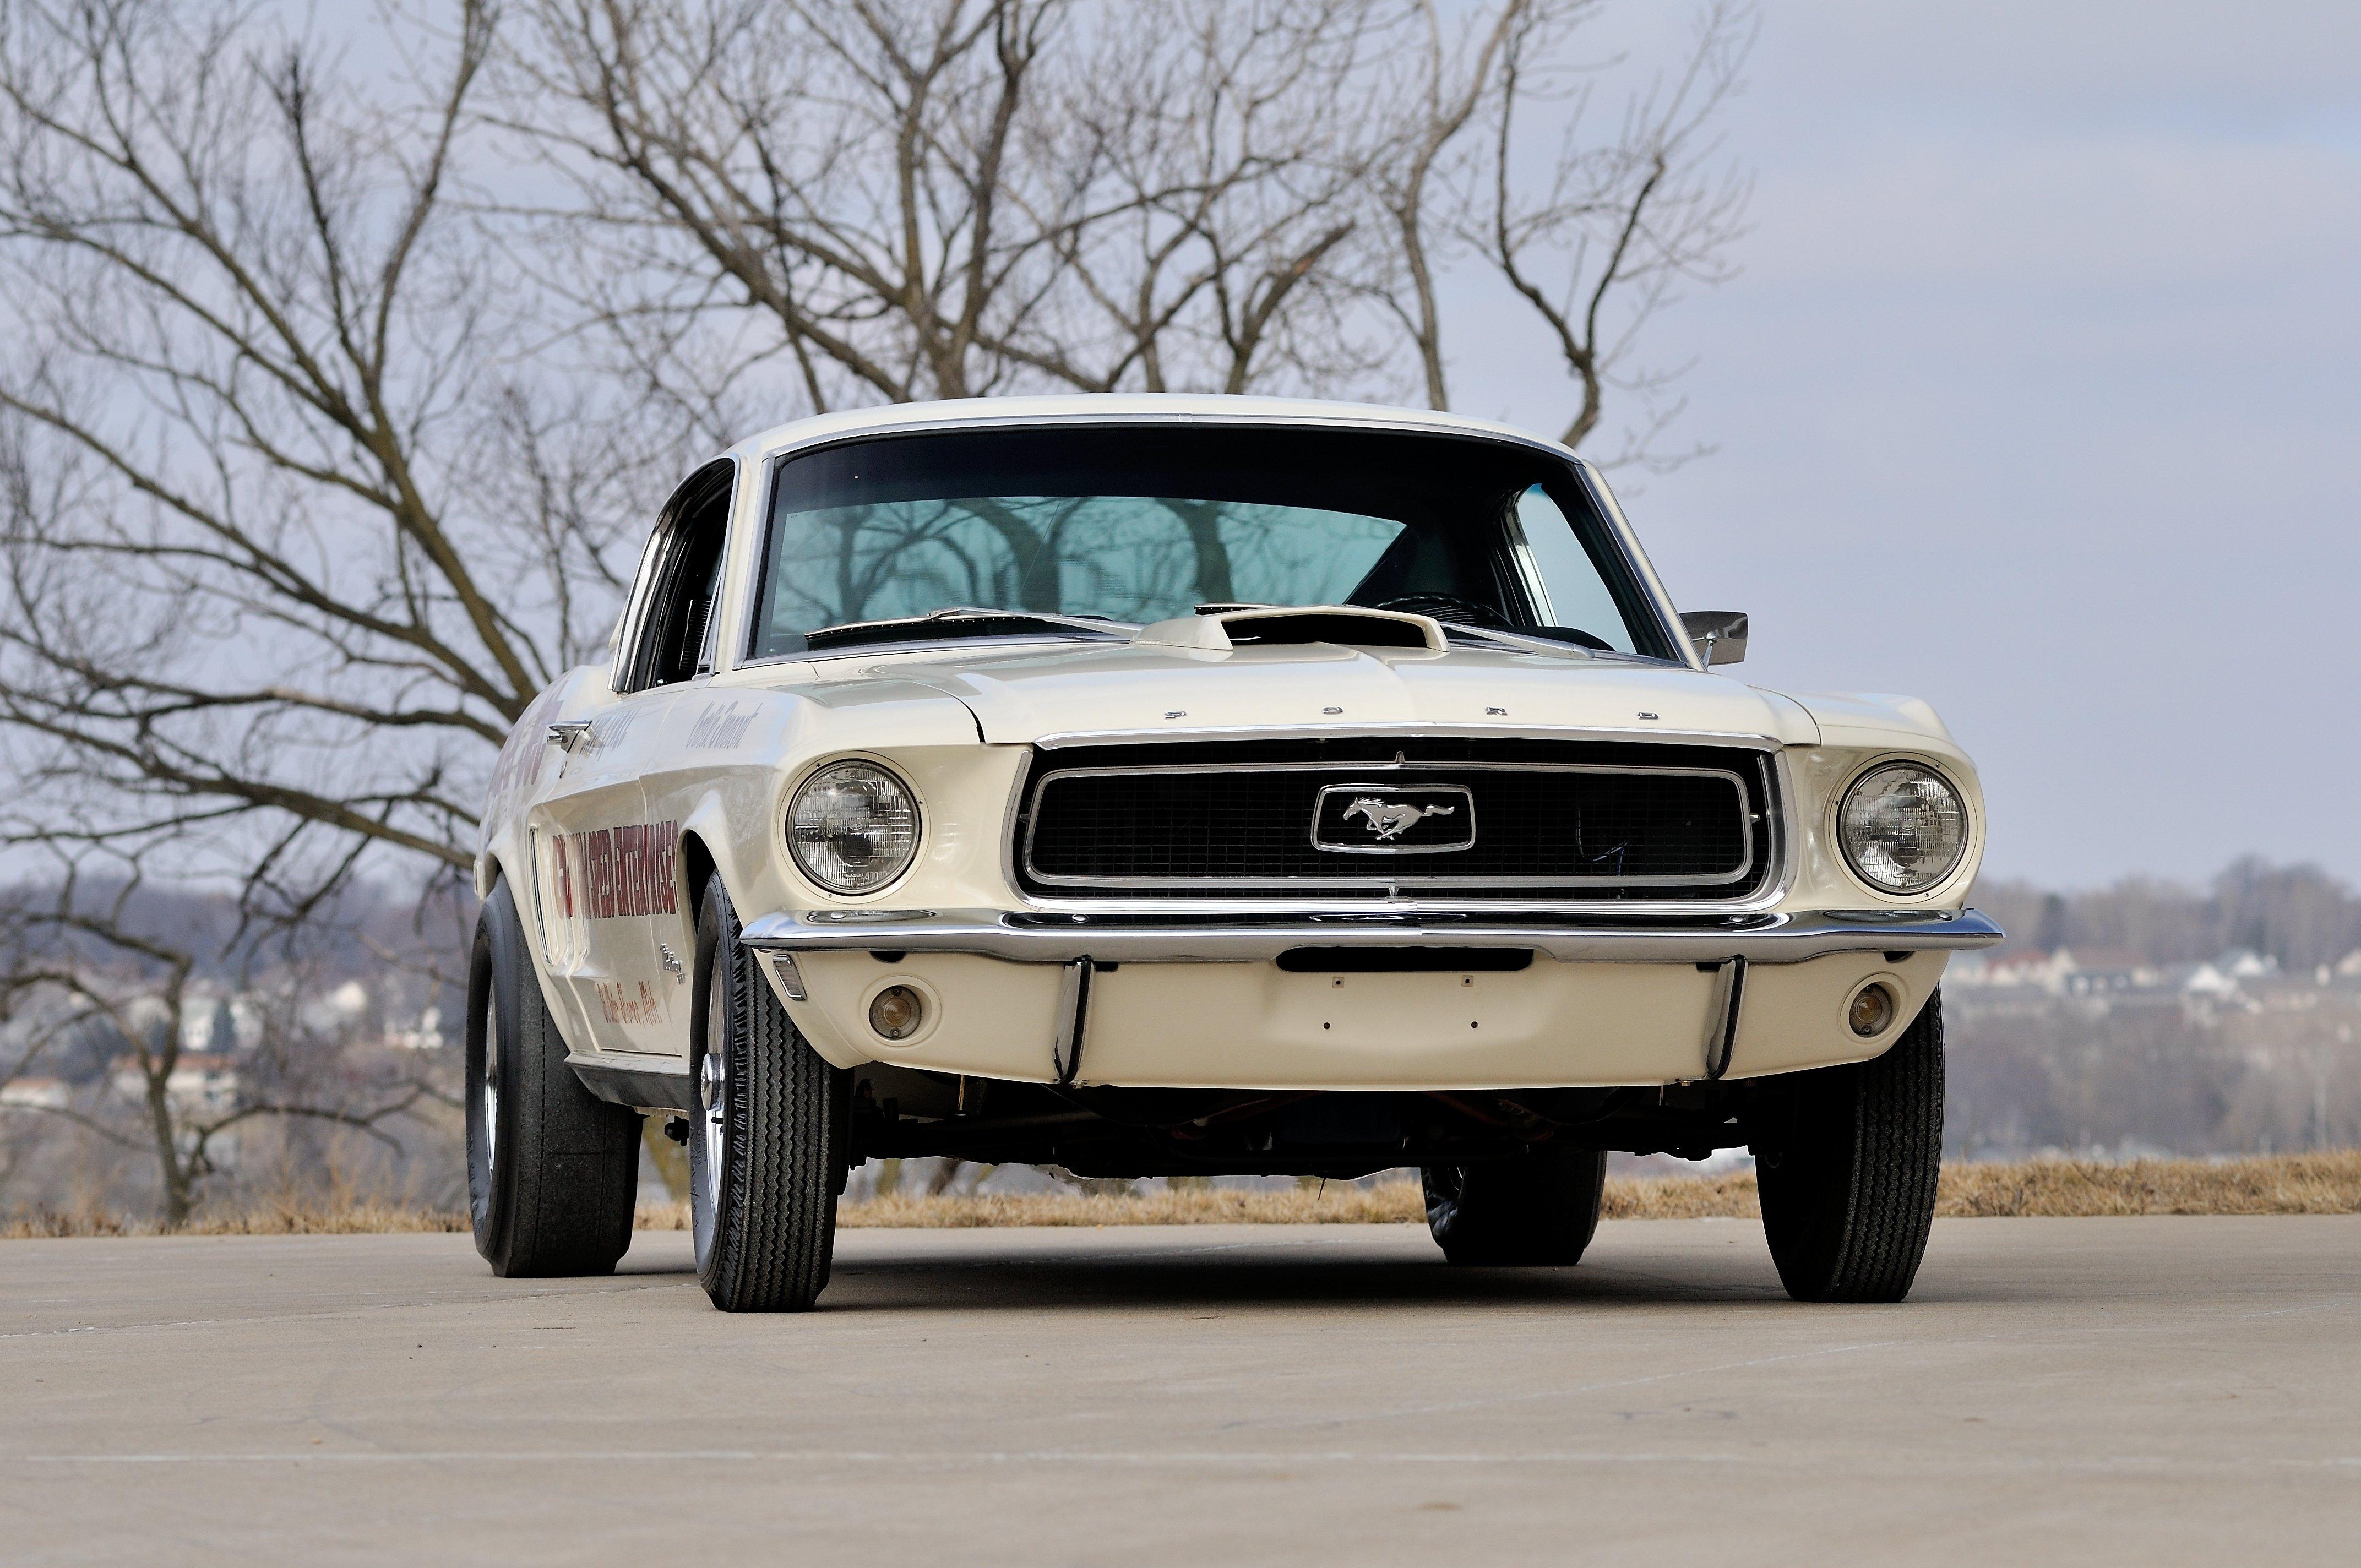 1968 ford mustang lightweight cj white drag dragster race usa 4288x2848 09 wallpaper 4288x2848 653805 wallpaperup